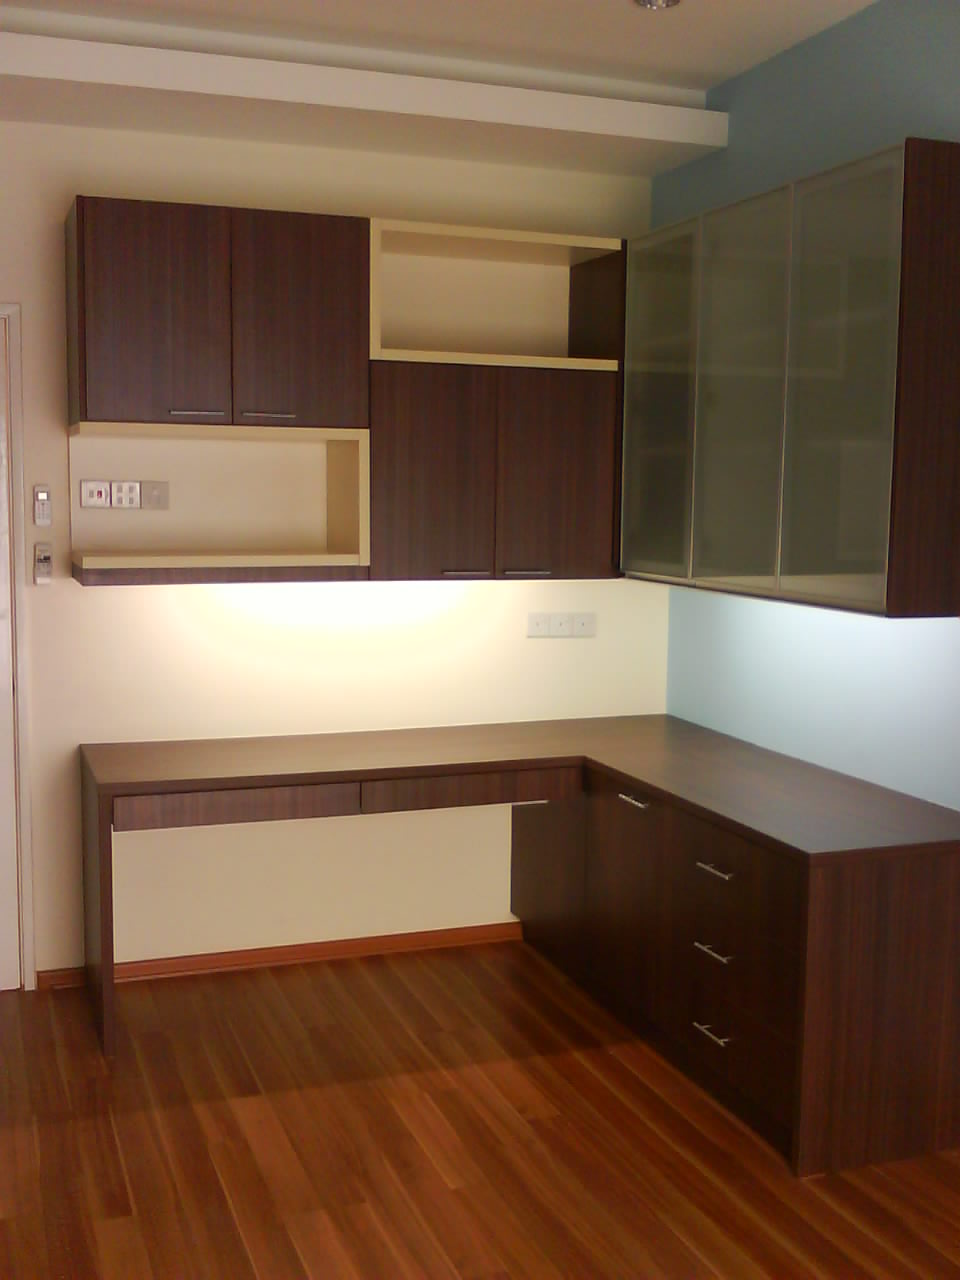 Glass Door Kitchen Cabinet Nook Sets With Storage Design Kuala Lumpur: Study